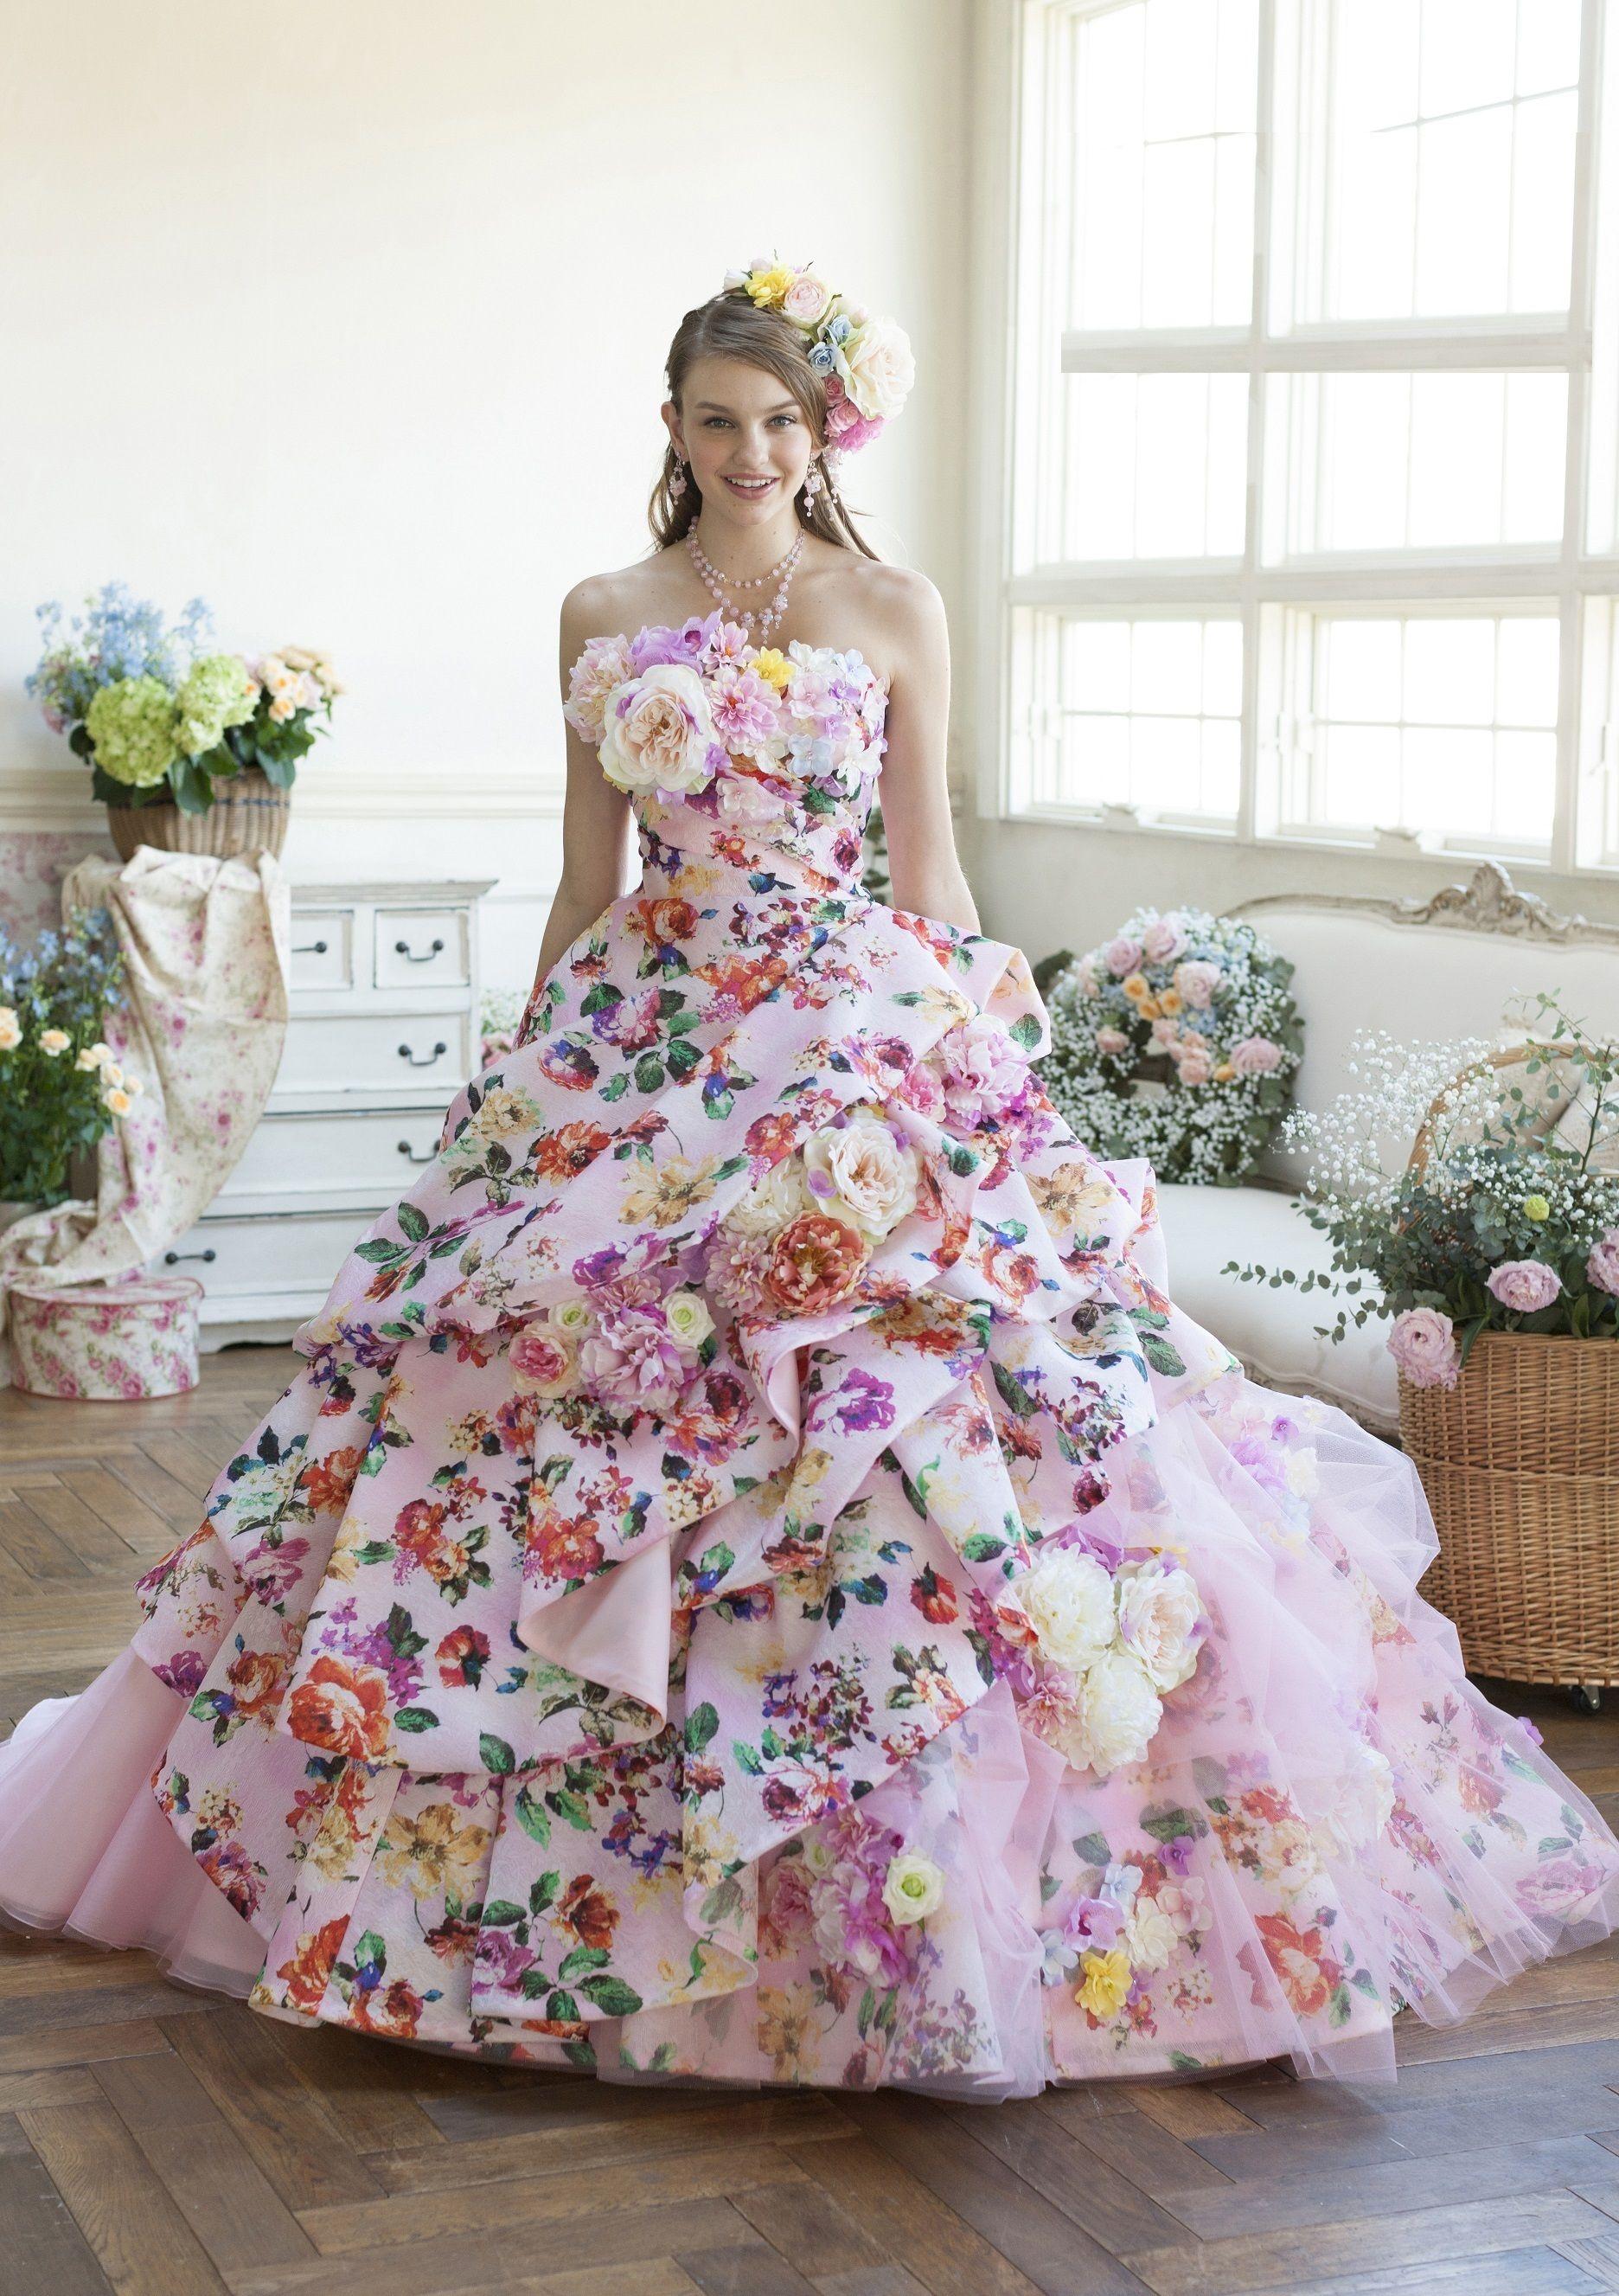 c54973e758e41 カラードレス ピンク 花柄プリント 35600